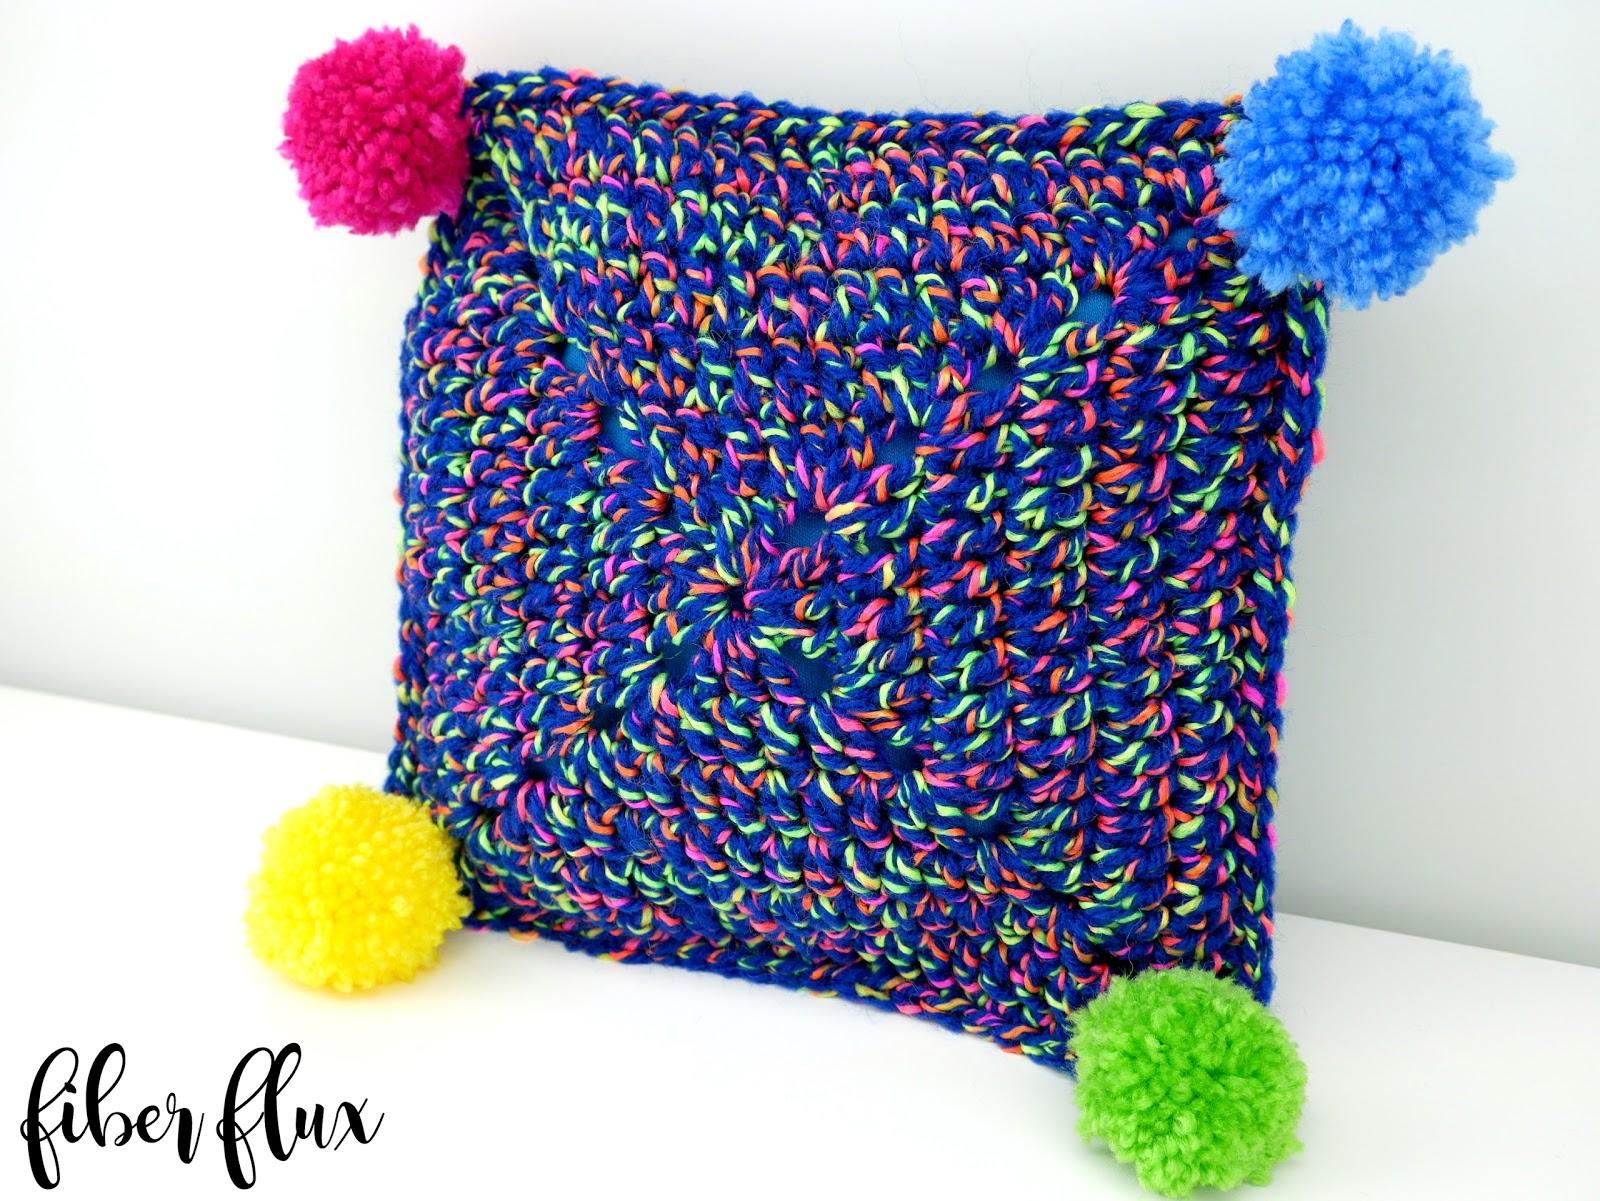 Free Crochet Patterns For Small Pillows : Fiber Flux: Free Crochet Pattern...Party Time Mini Pillow!